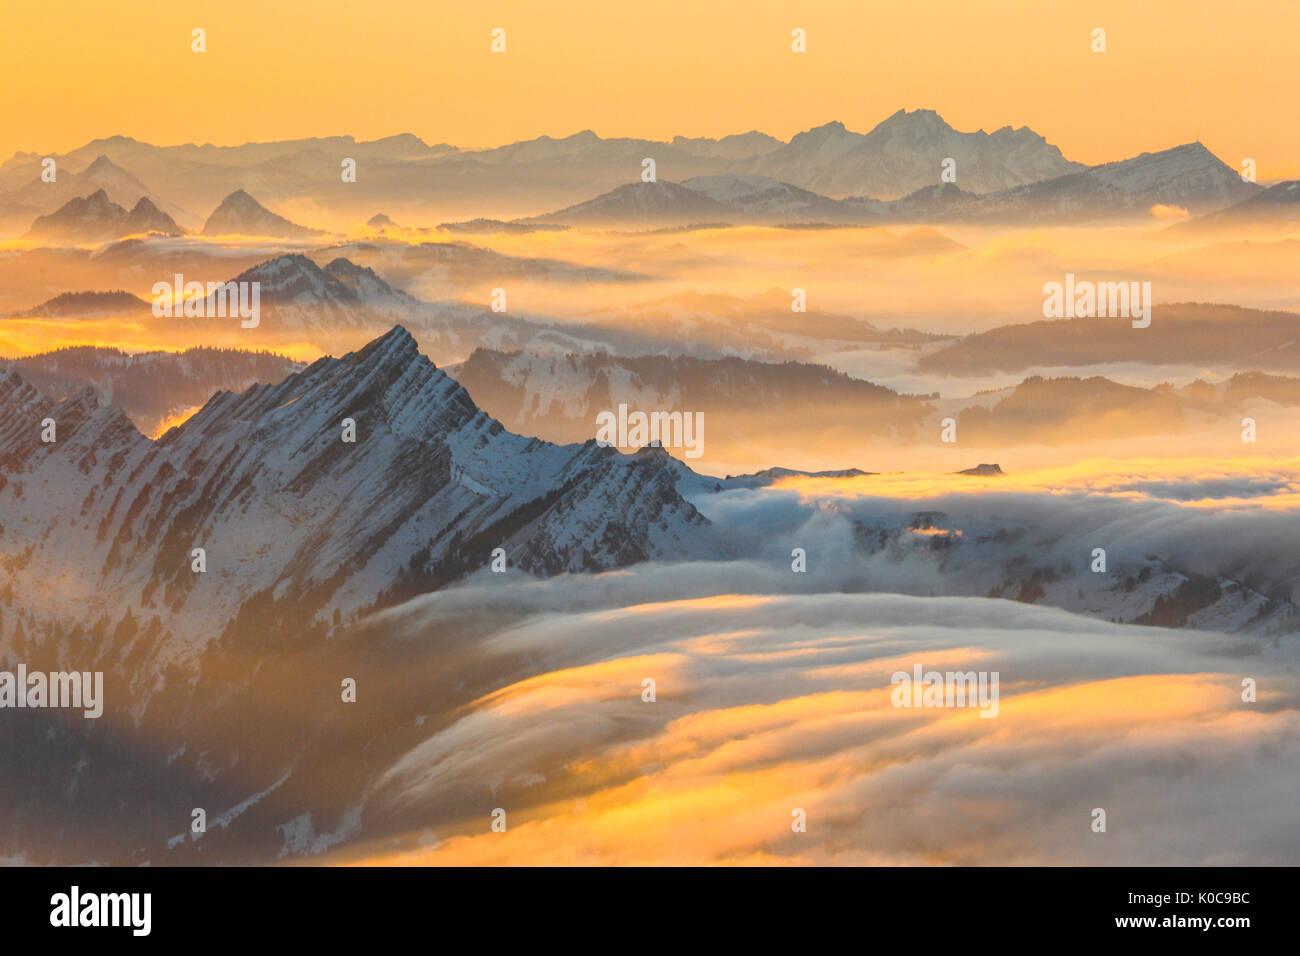 Speer, Pilatus, Rigi, Schweizer Alpen, Schweiz Stockbild